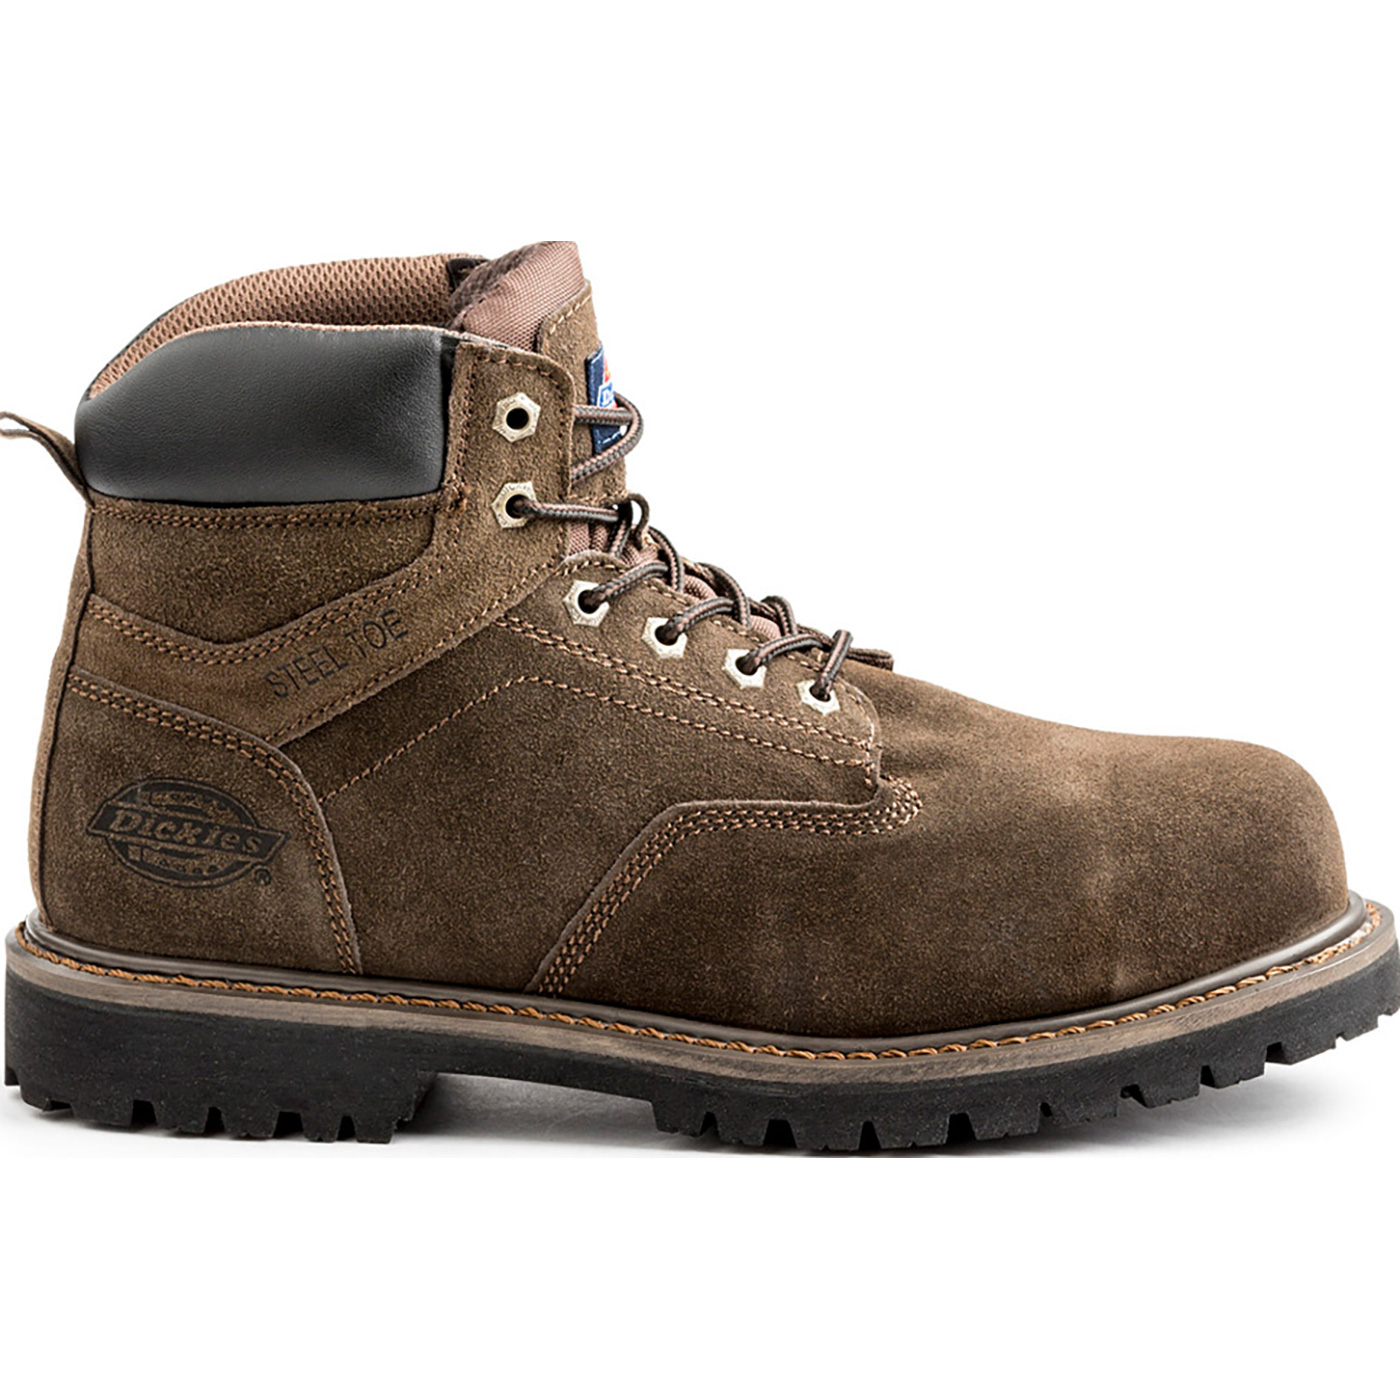 c36d102fac4 Dickies Prowler Men's Steel Toe Work Boot